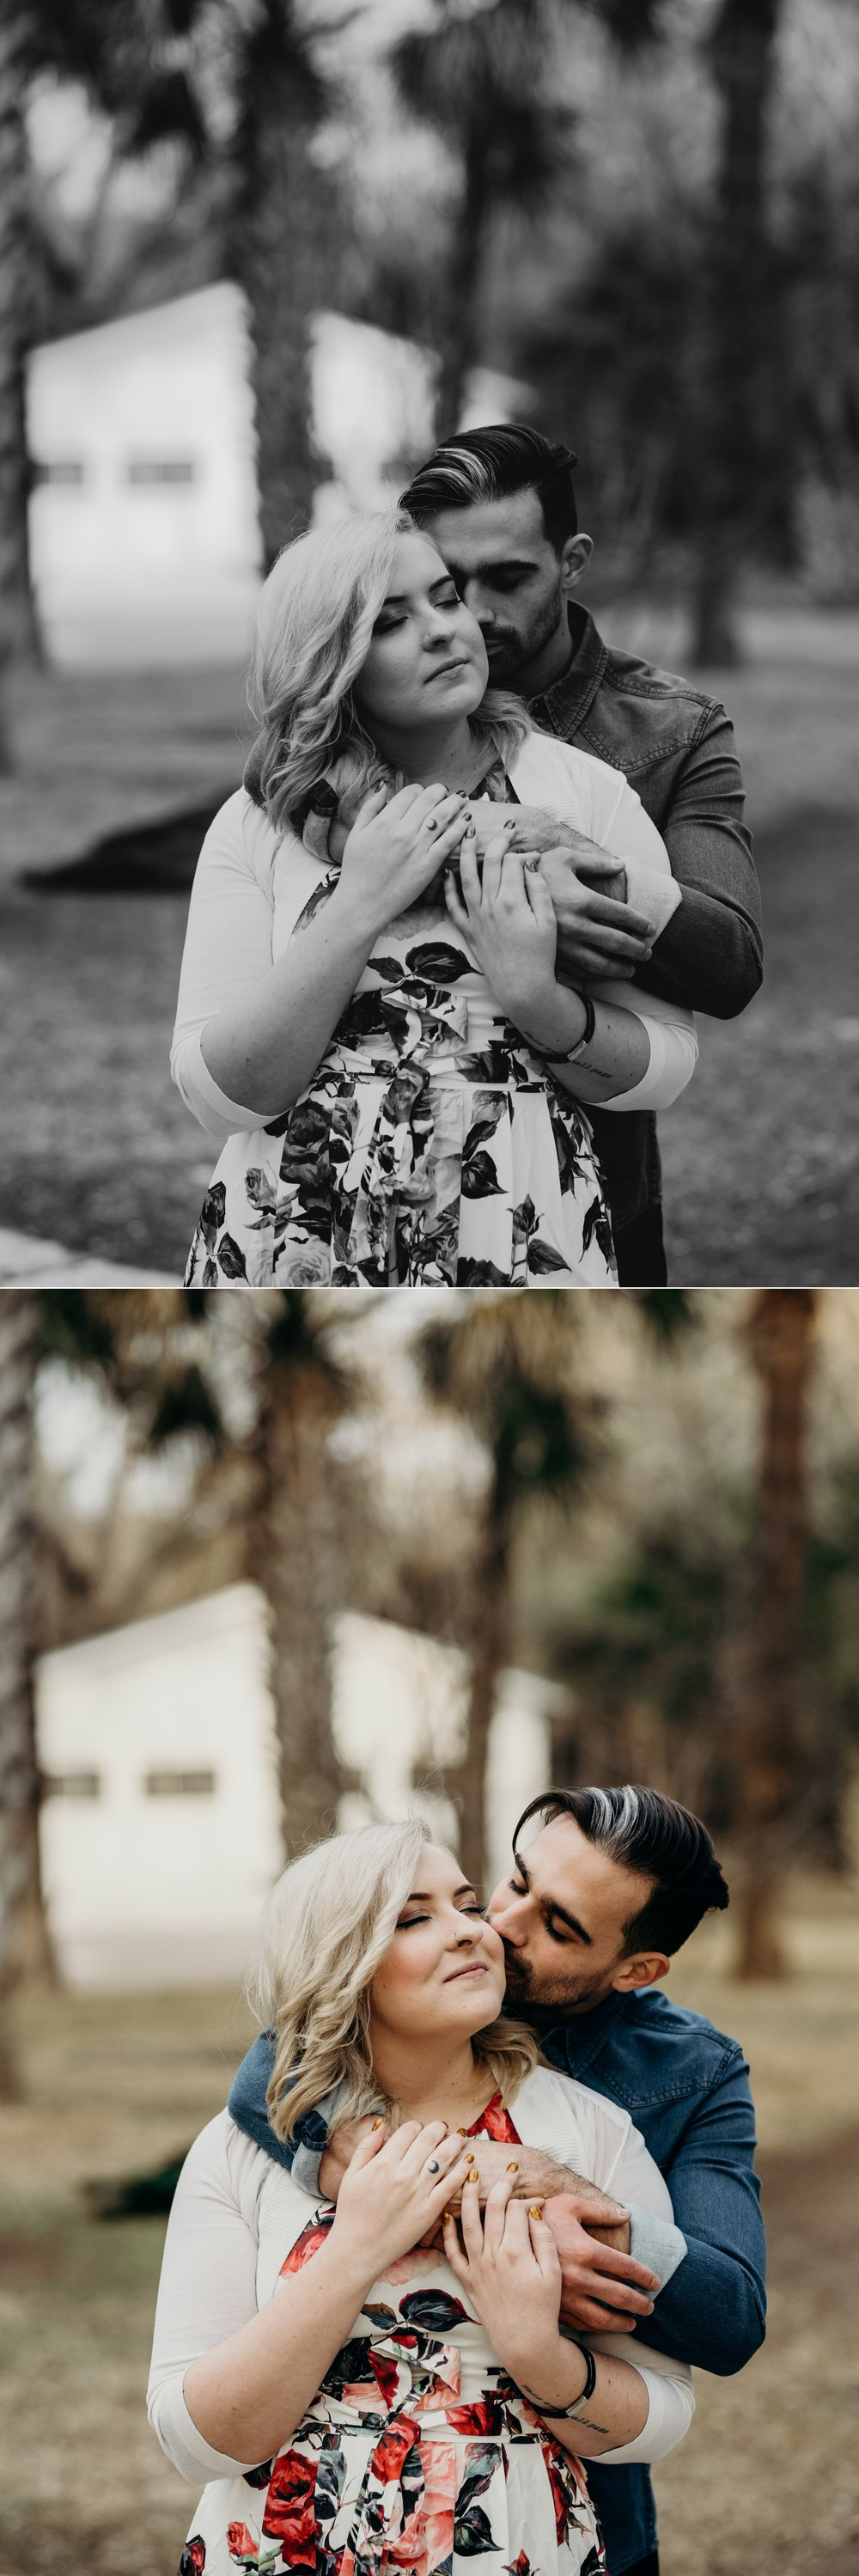 drew-andrew-texas-austin-minnesota-minneapolis-wedding-photographer-destination-elopement-intimate-adventurous_0100.jpg